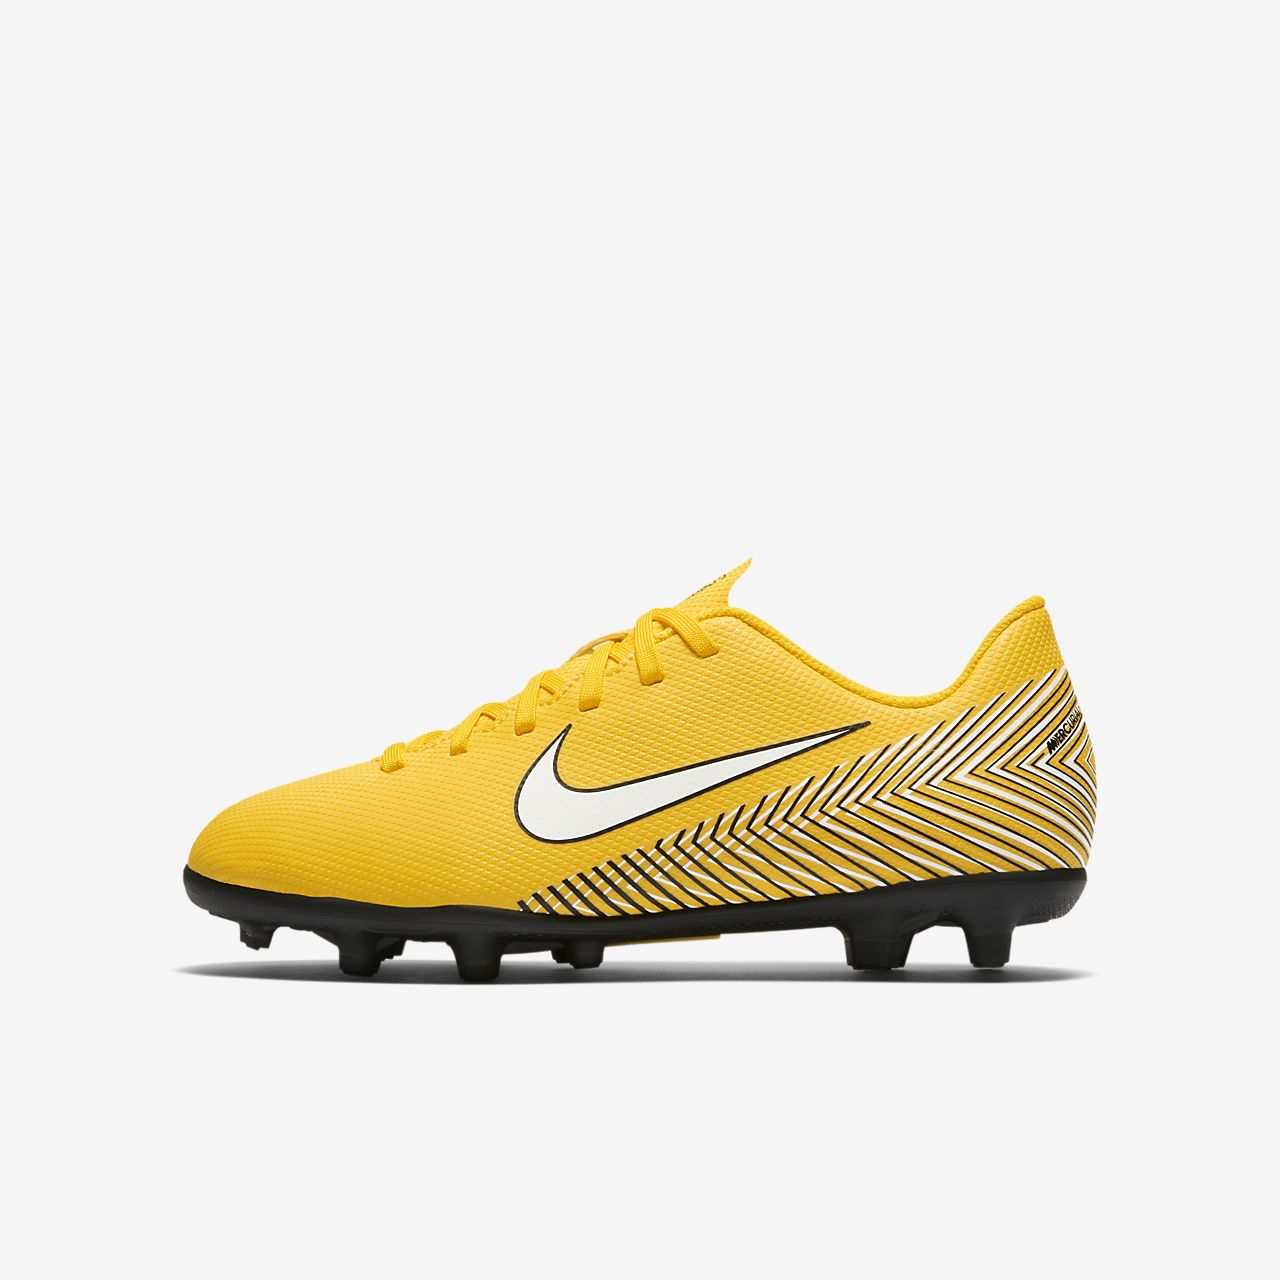 De JrMercurial Multi Terrains Crampons Chaussure Nike Football À E9IWHD2